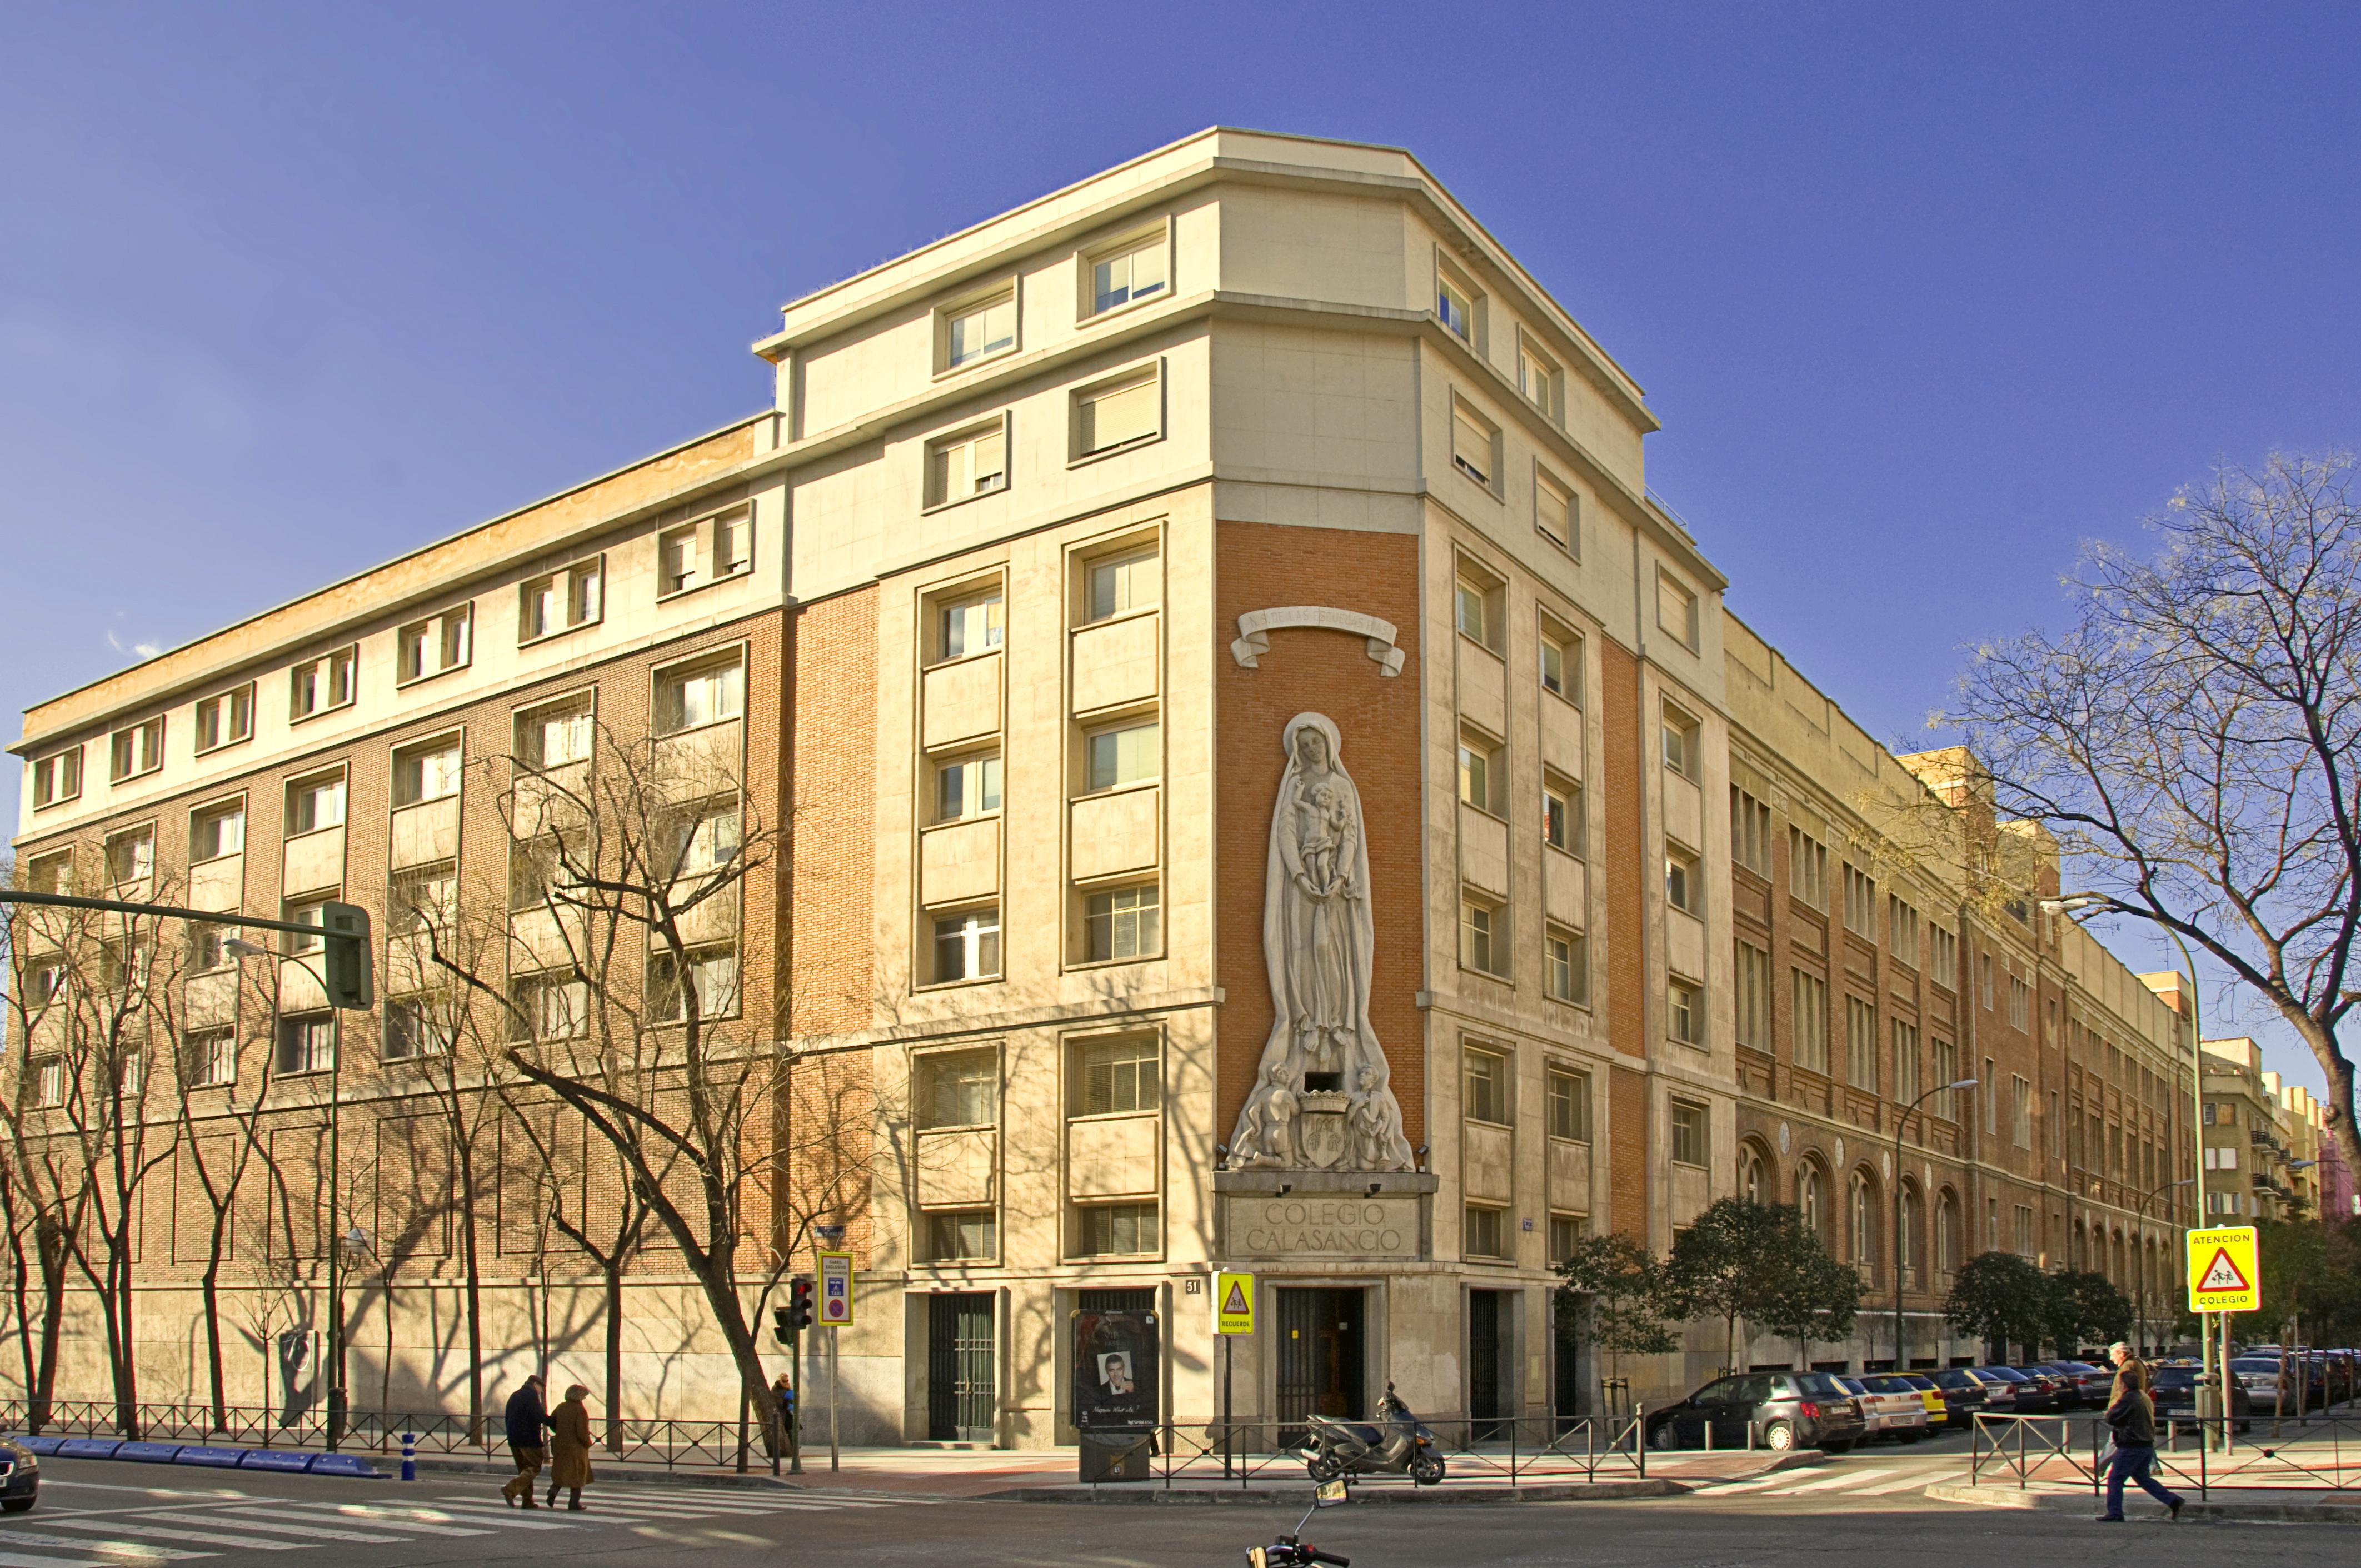 File colegio calasancio de las escuelas p as madrid - Colegio escolapias madrid ...